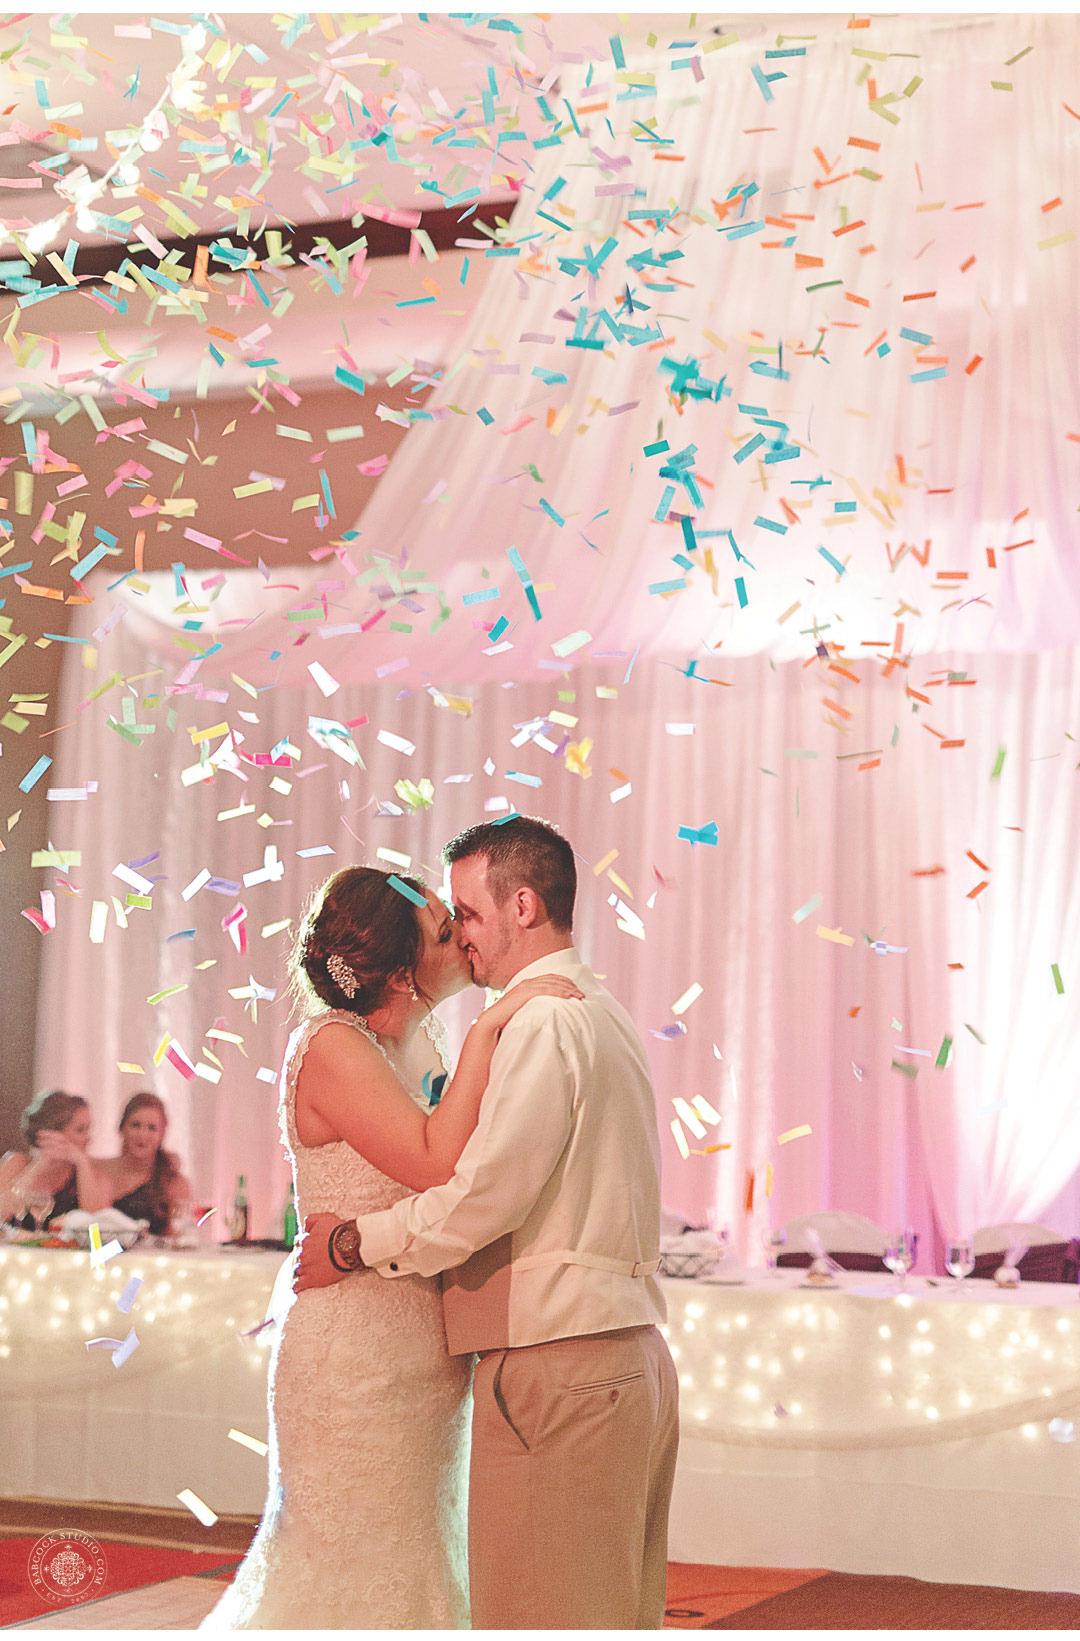 0051_sarah-john--dayton-wedding-photographer-cox-arboretum-51.jpg